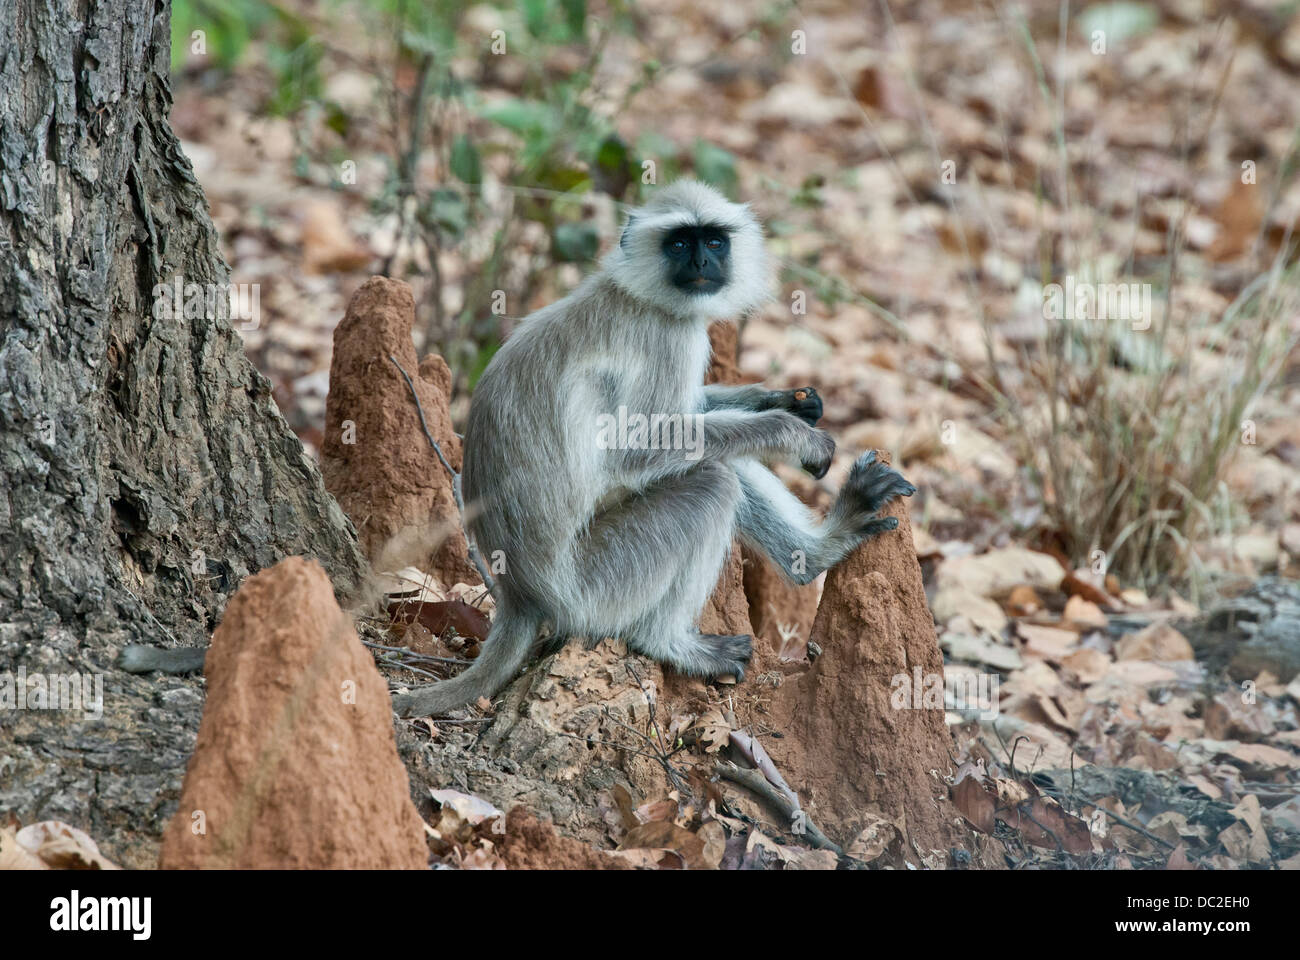 Black-faced Langur monkey sitting on a termite mound in Bandhavgarh National Park, India - Stock Image